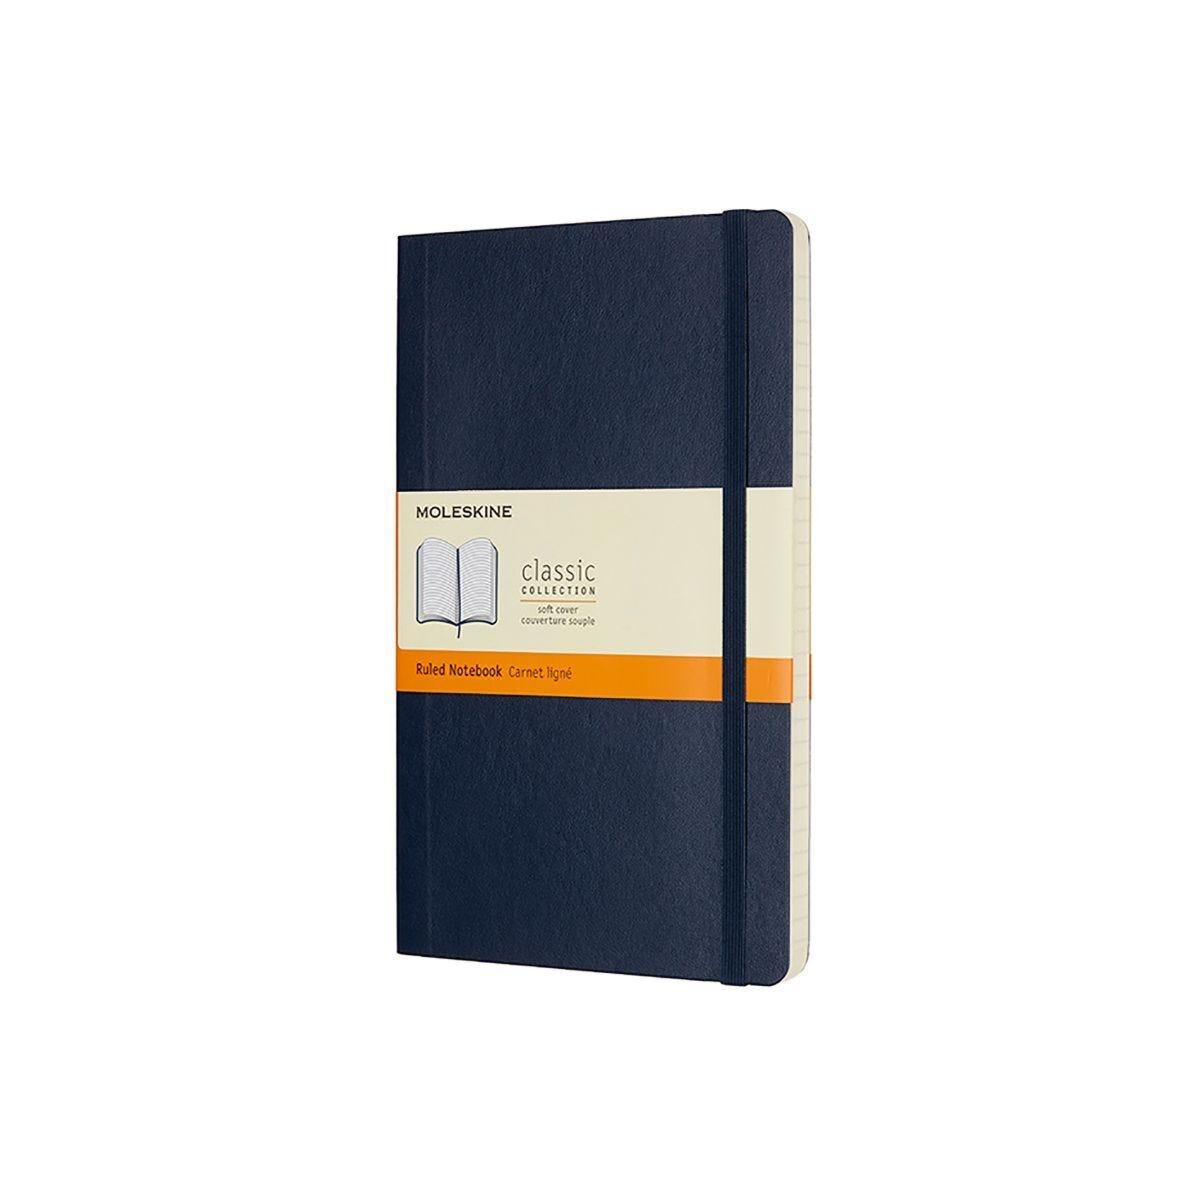 Moleskine Soft Cover Classic Notebook Large Ruled Dark Blue